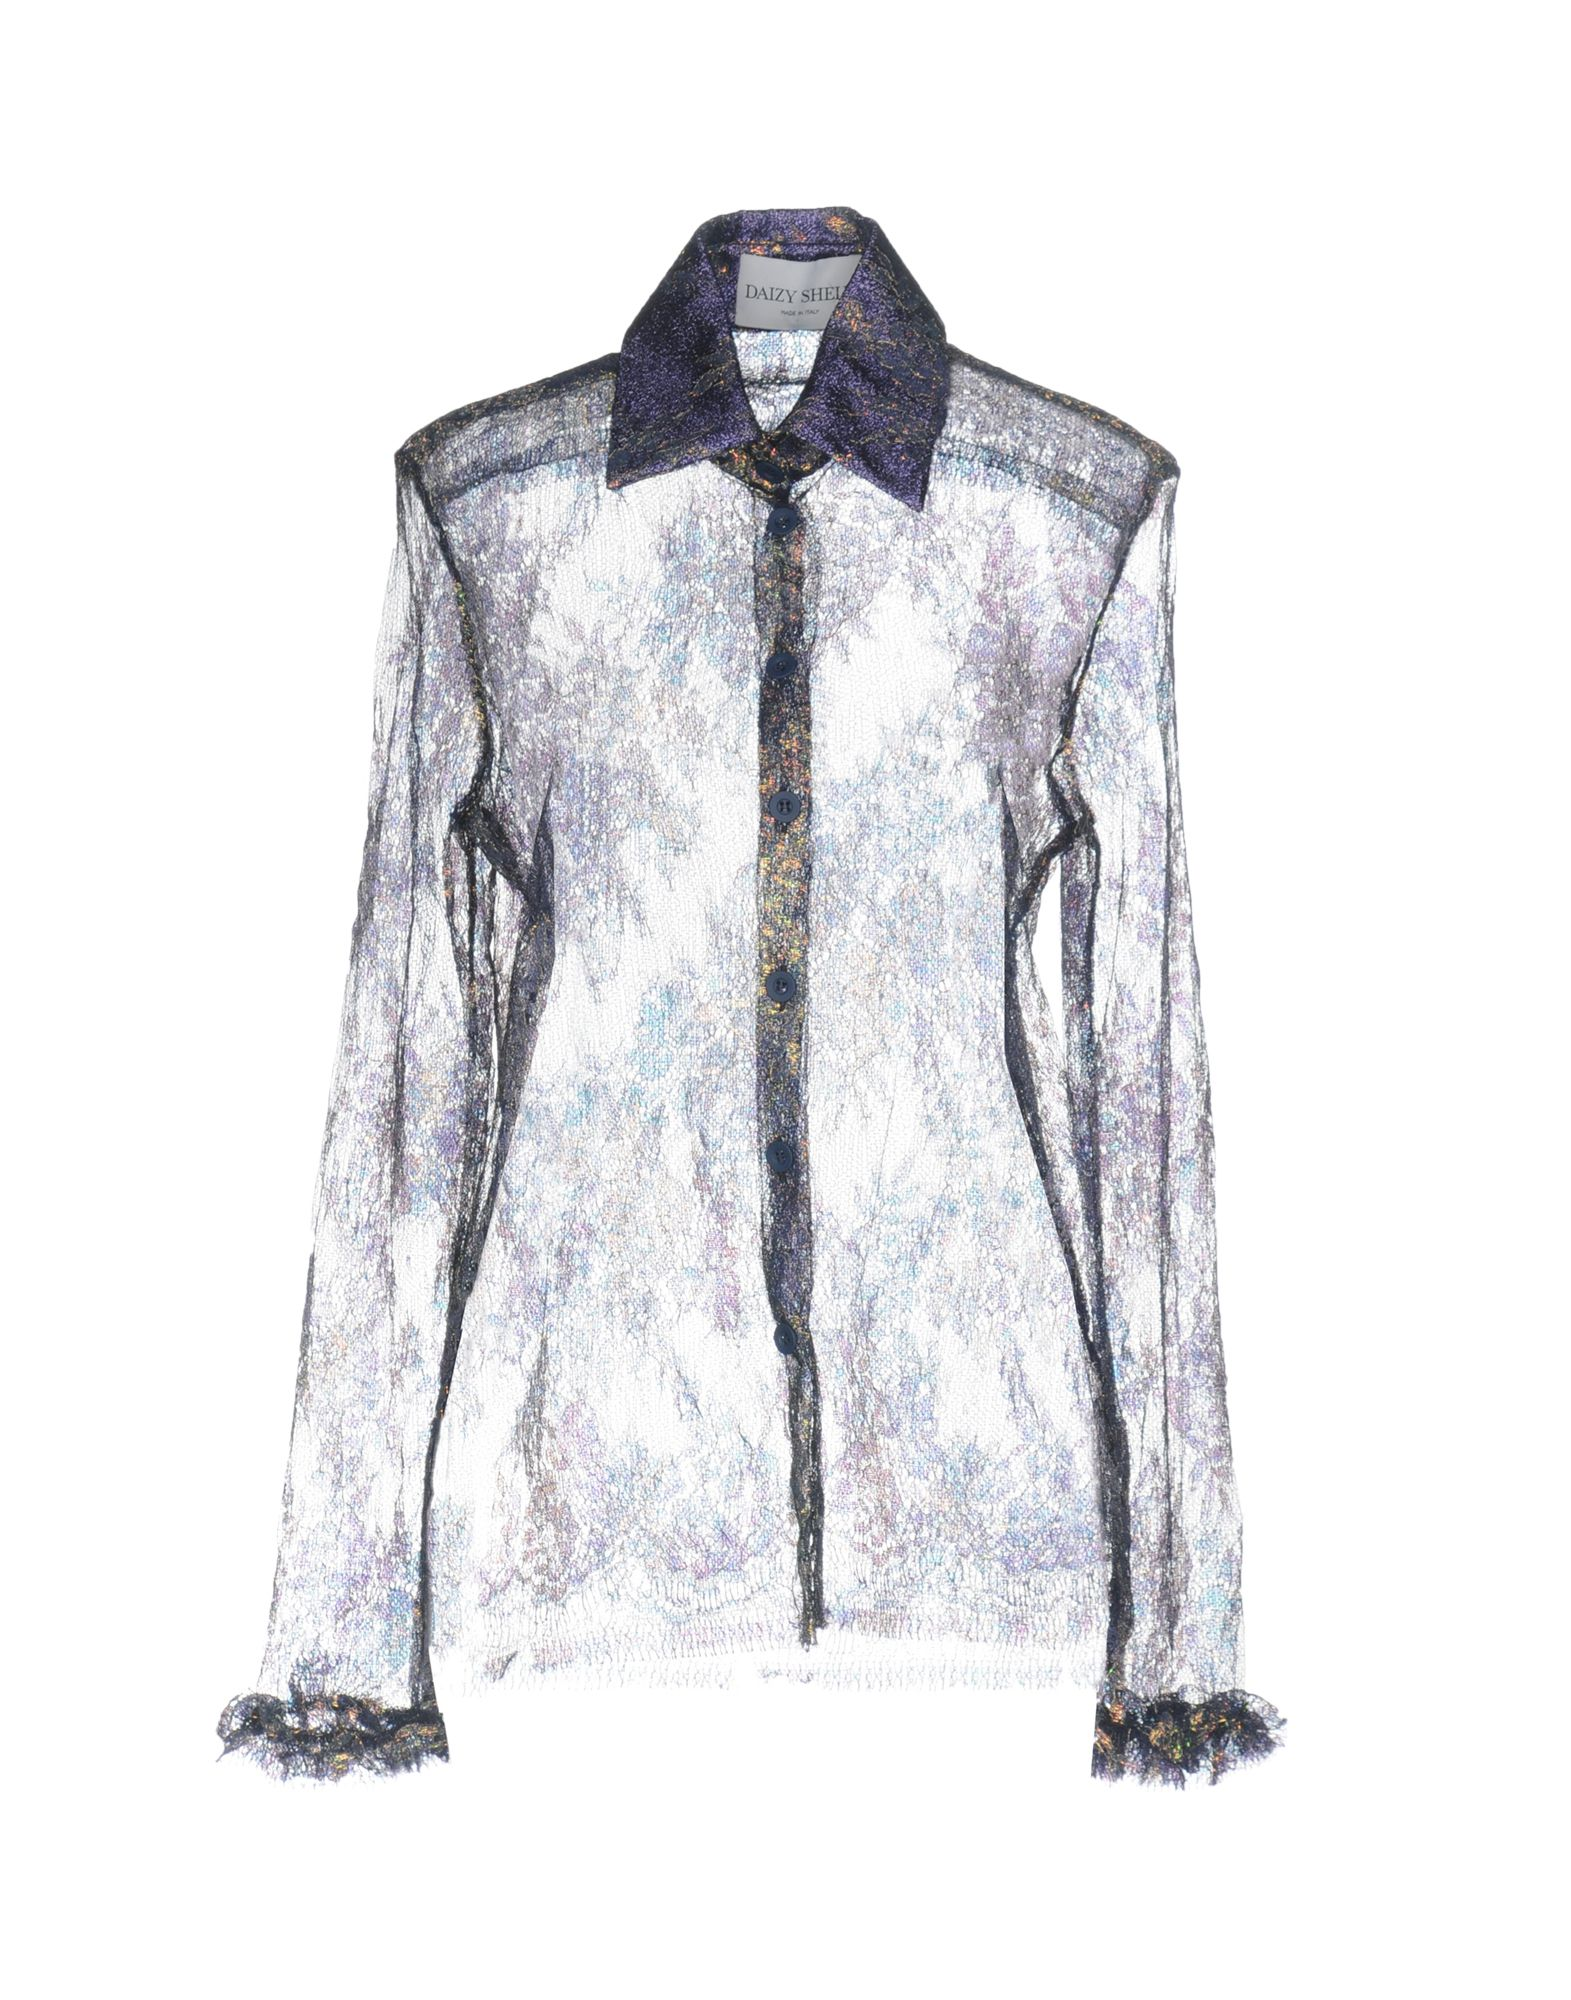 Camicie E Bluse A Fiori Daizy Shely Donna - Acquista online su tVRWFJI